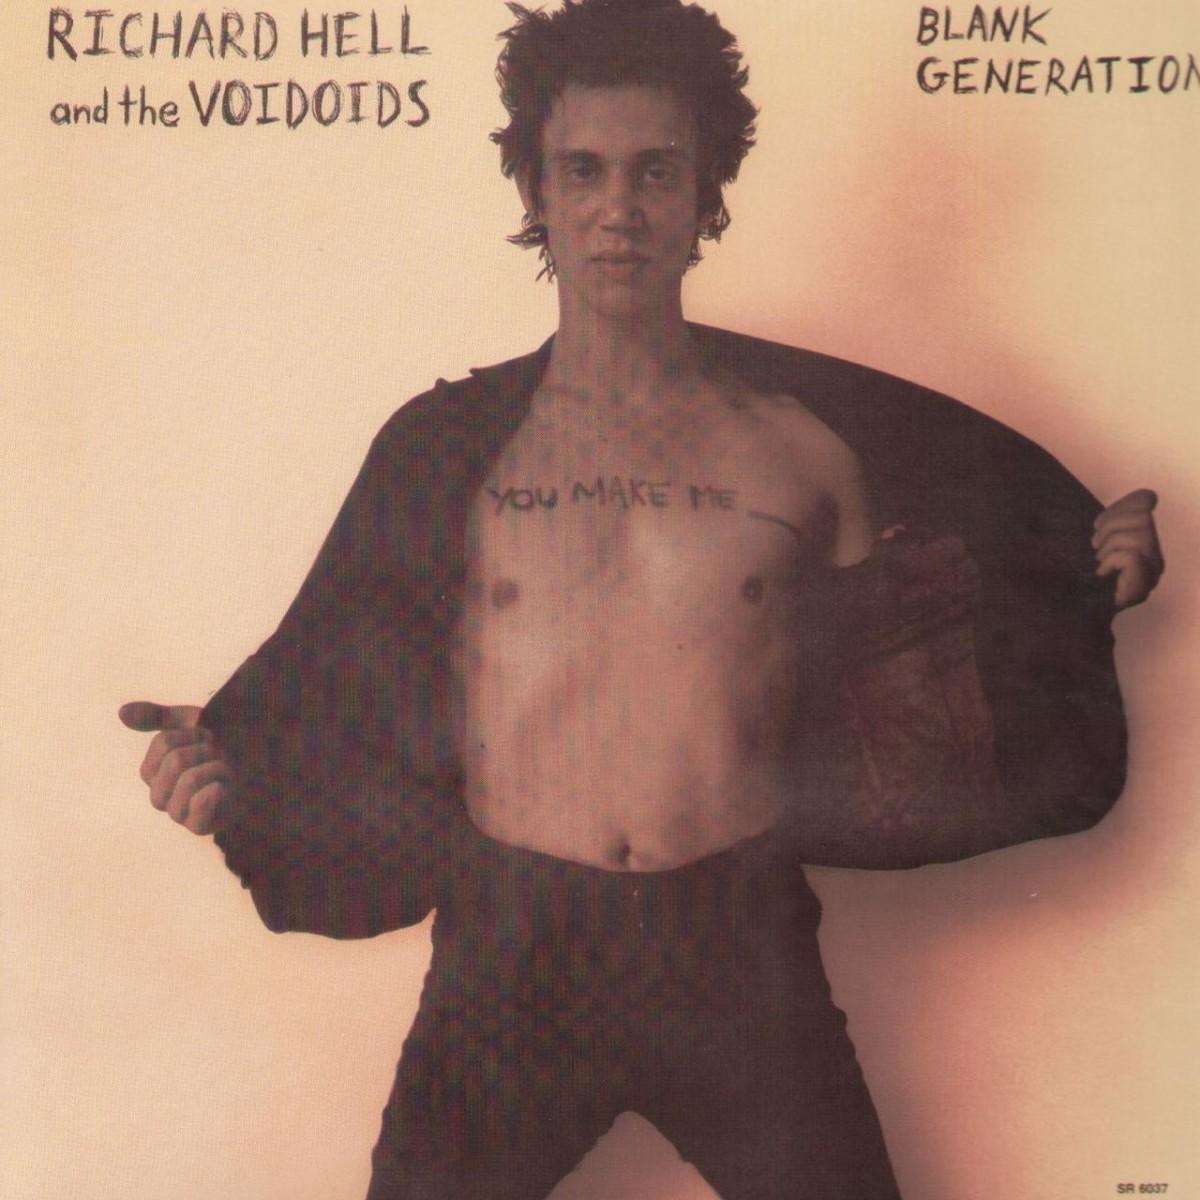 Richard Hell Blank Generation reissue